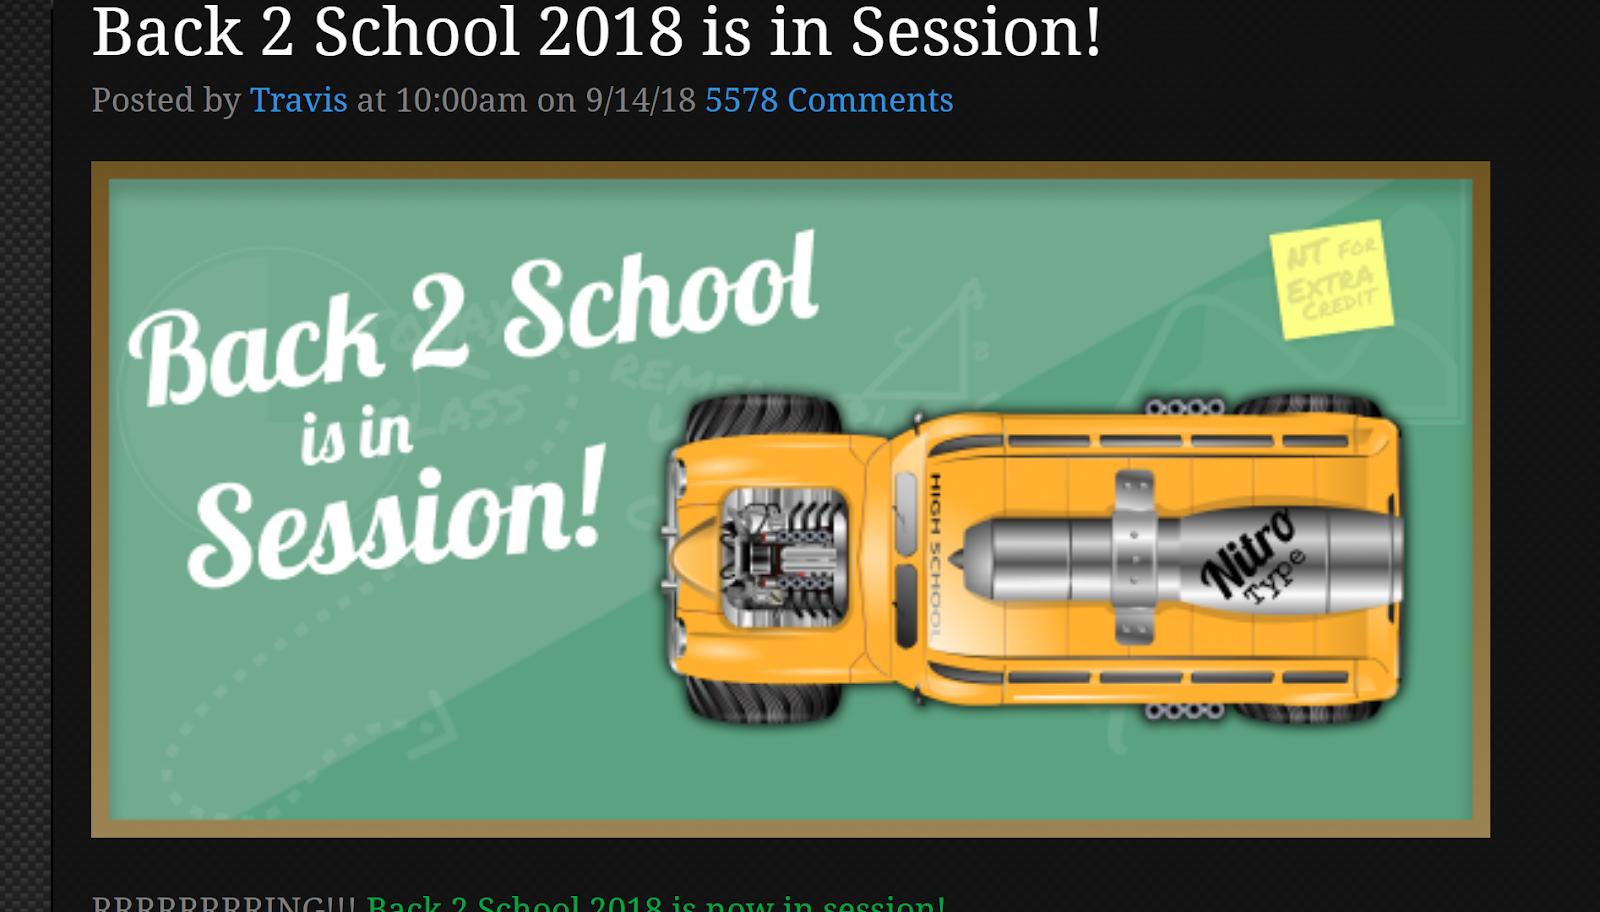 Back 2 School Event Cars Information